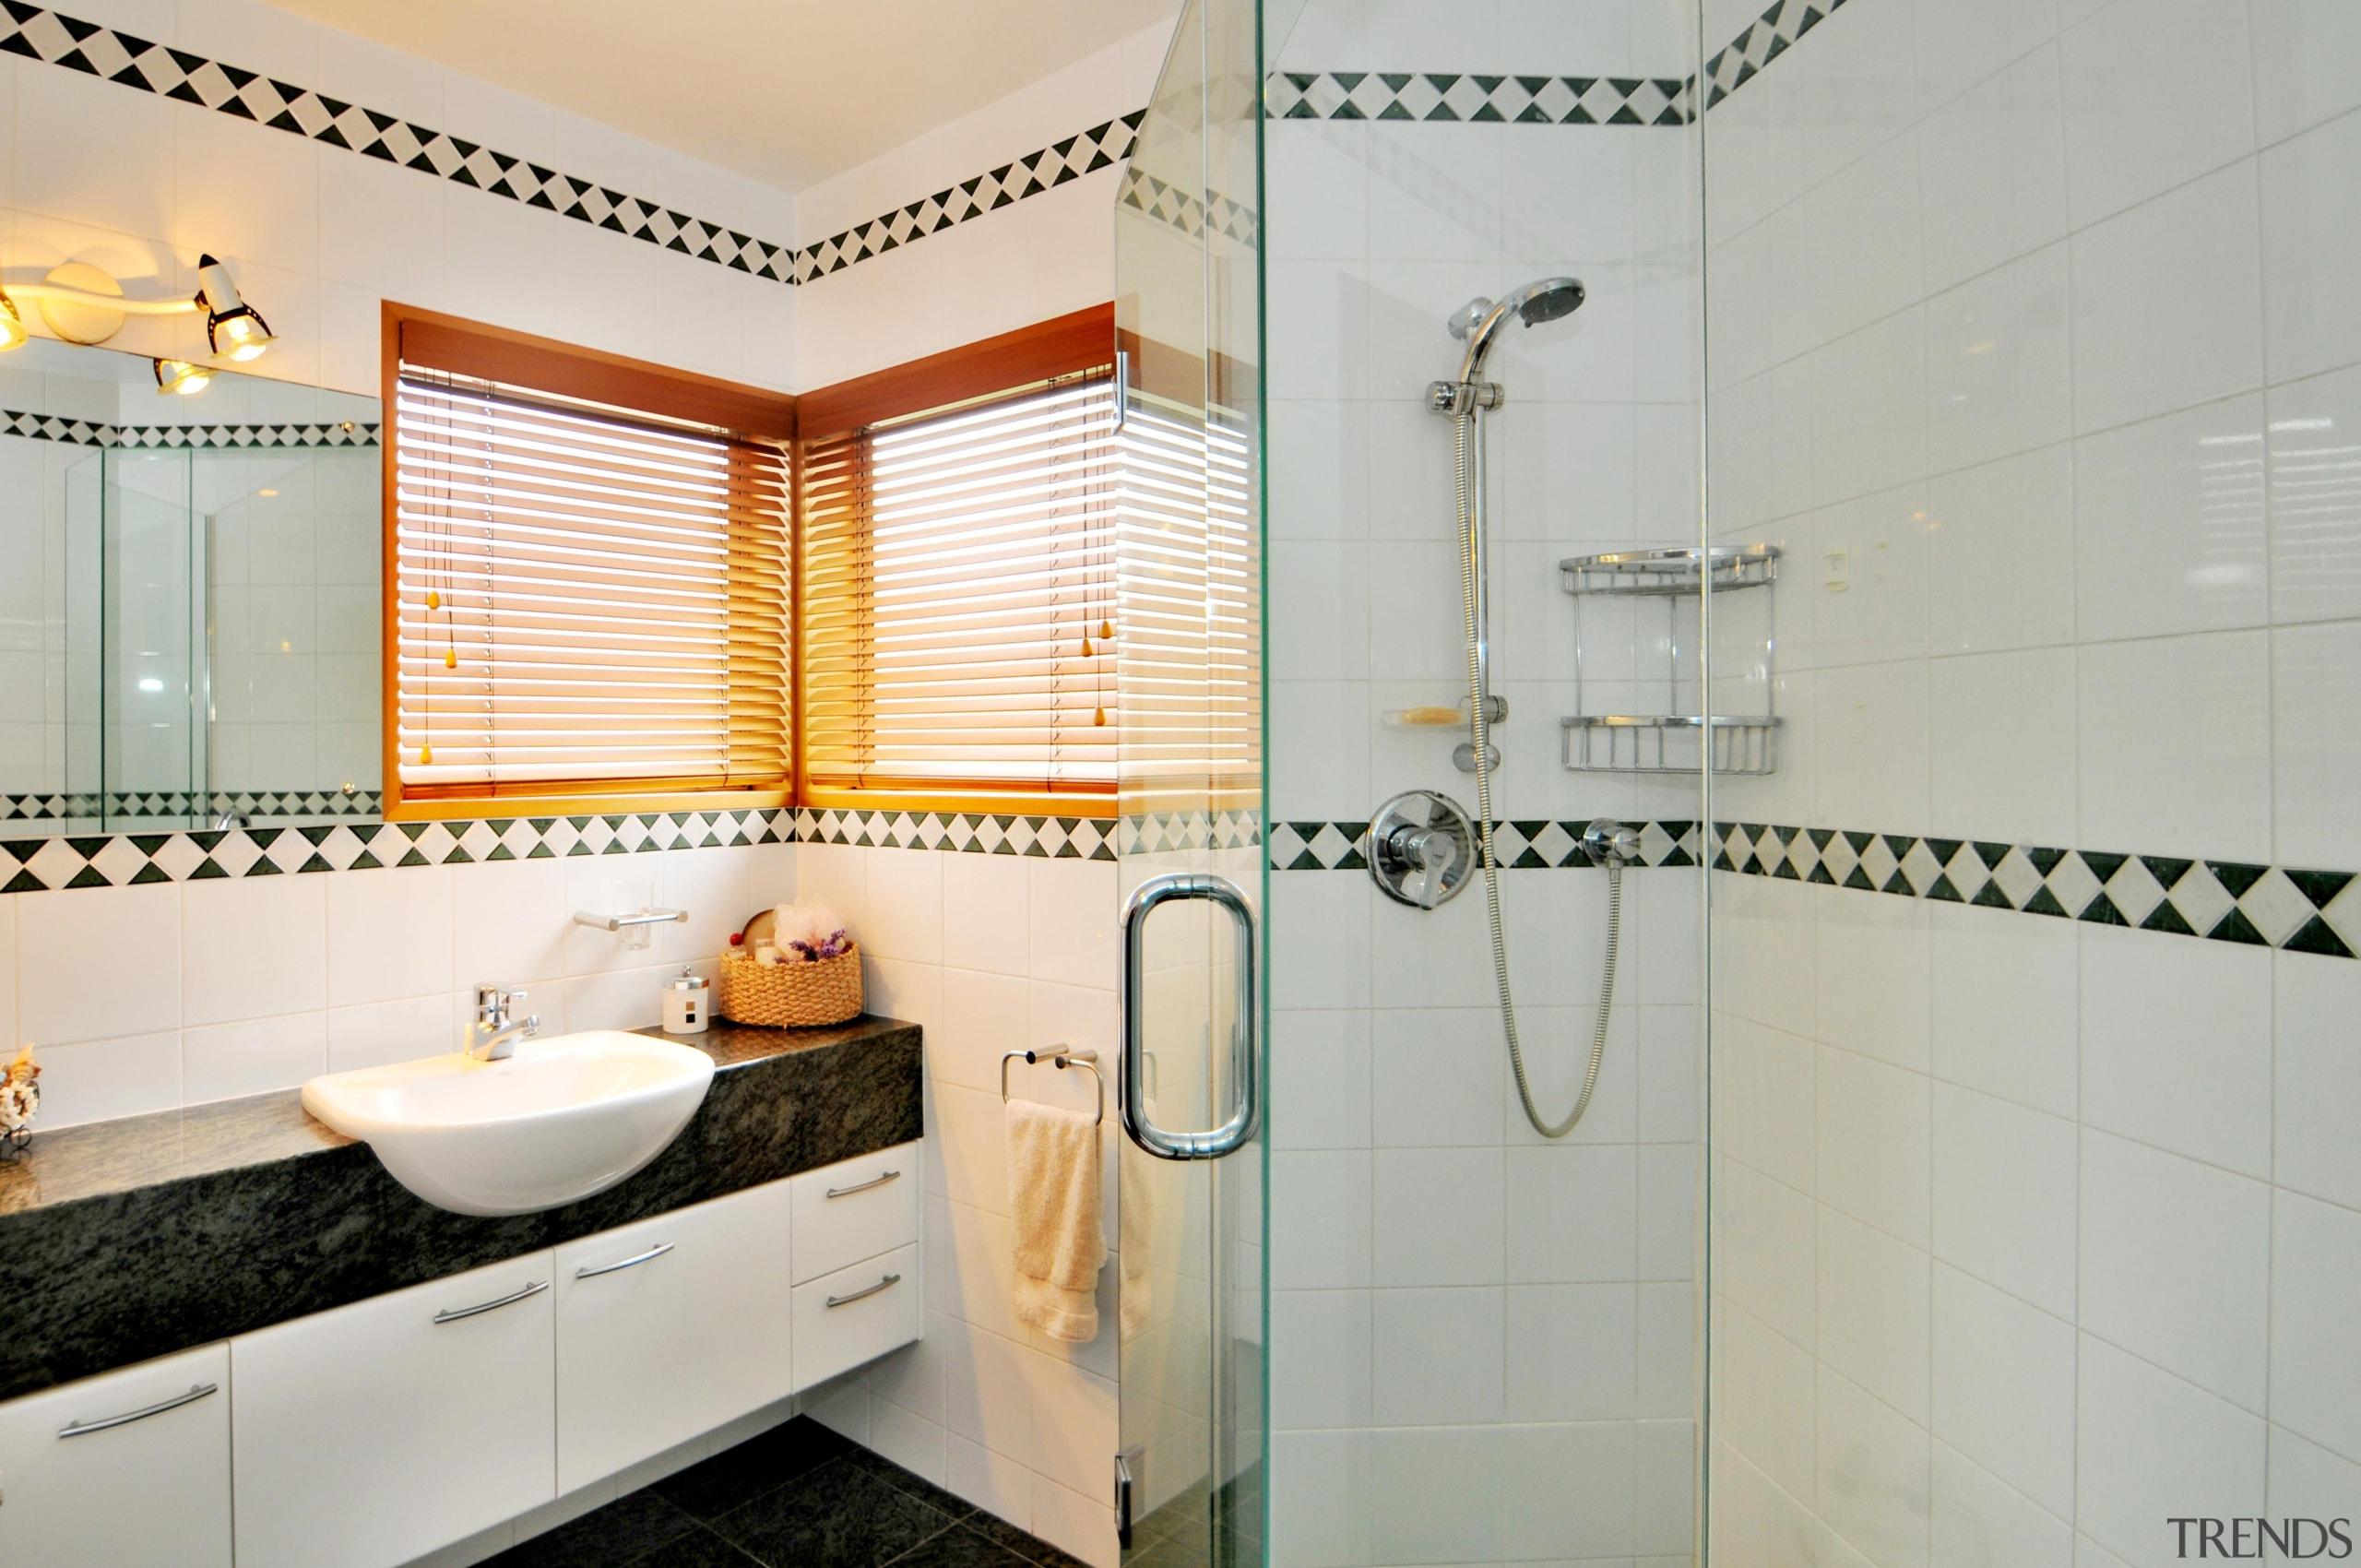 24 bathroom - Bathroom - bathroom   floor bathroom, floor, home, interior design, property, real estate, room, tile, gray